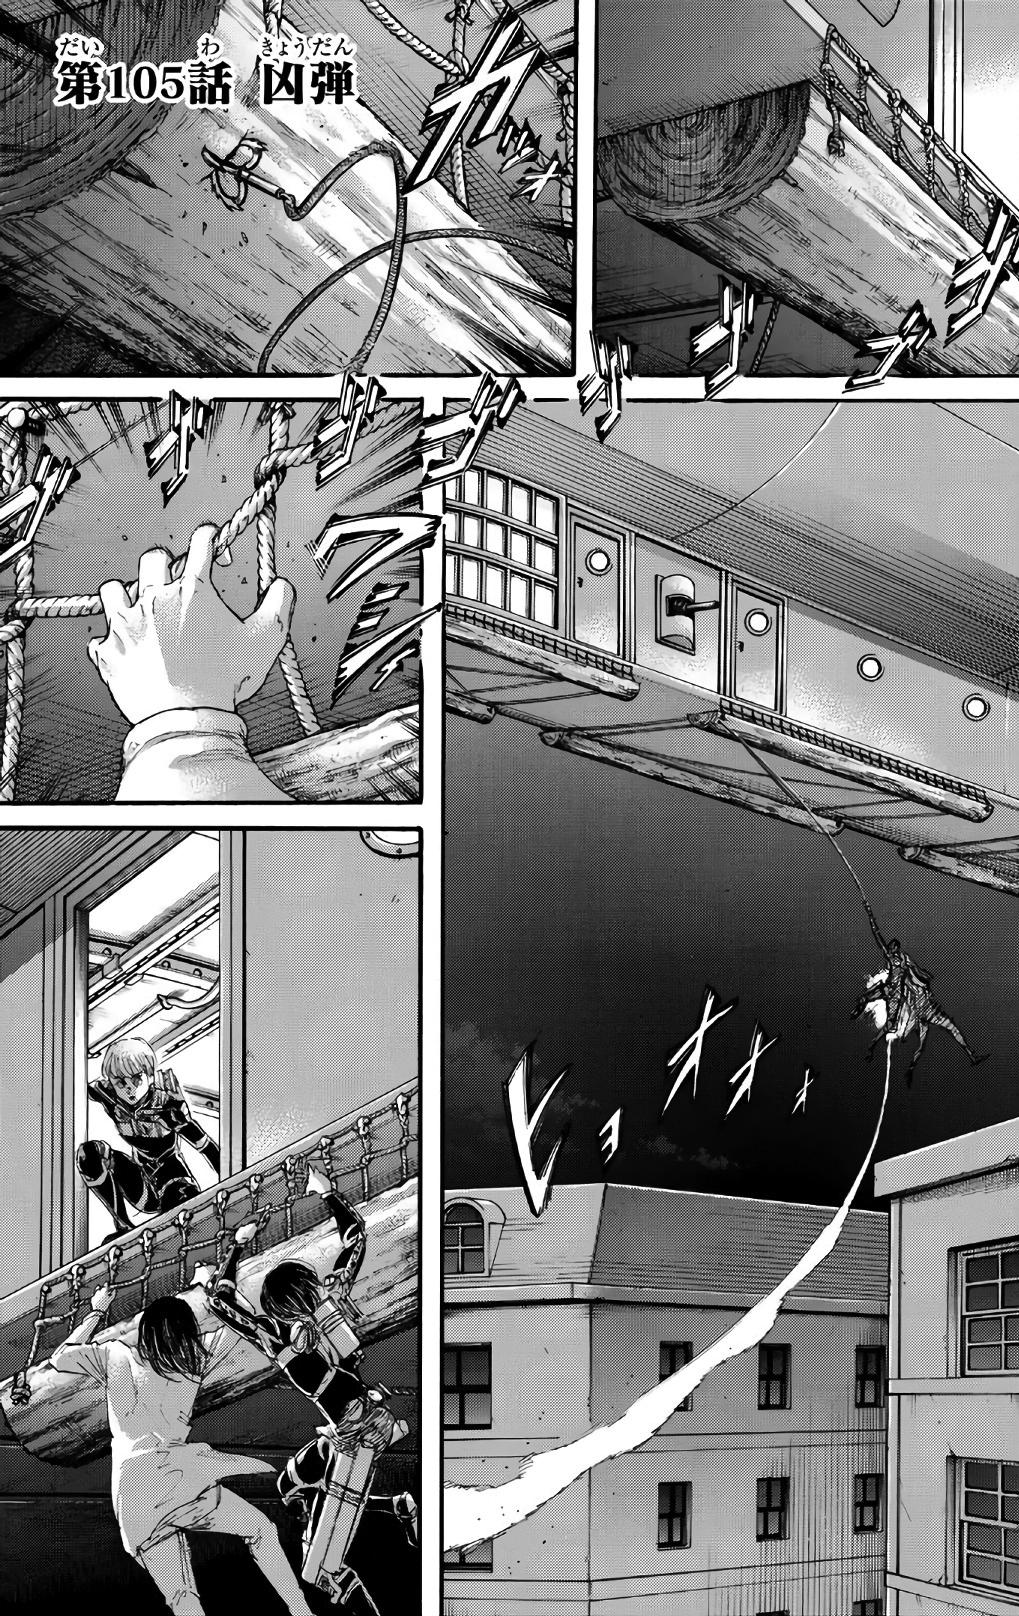 Атака титанов упм своими руками